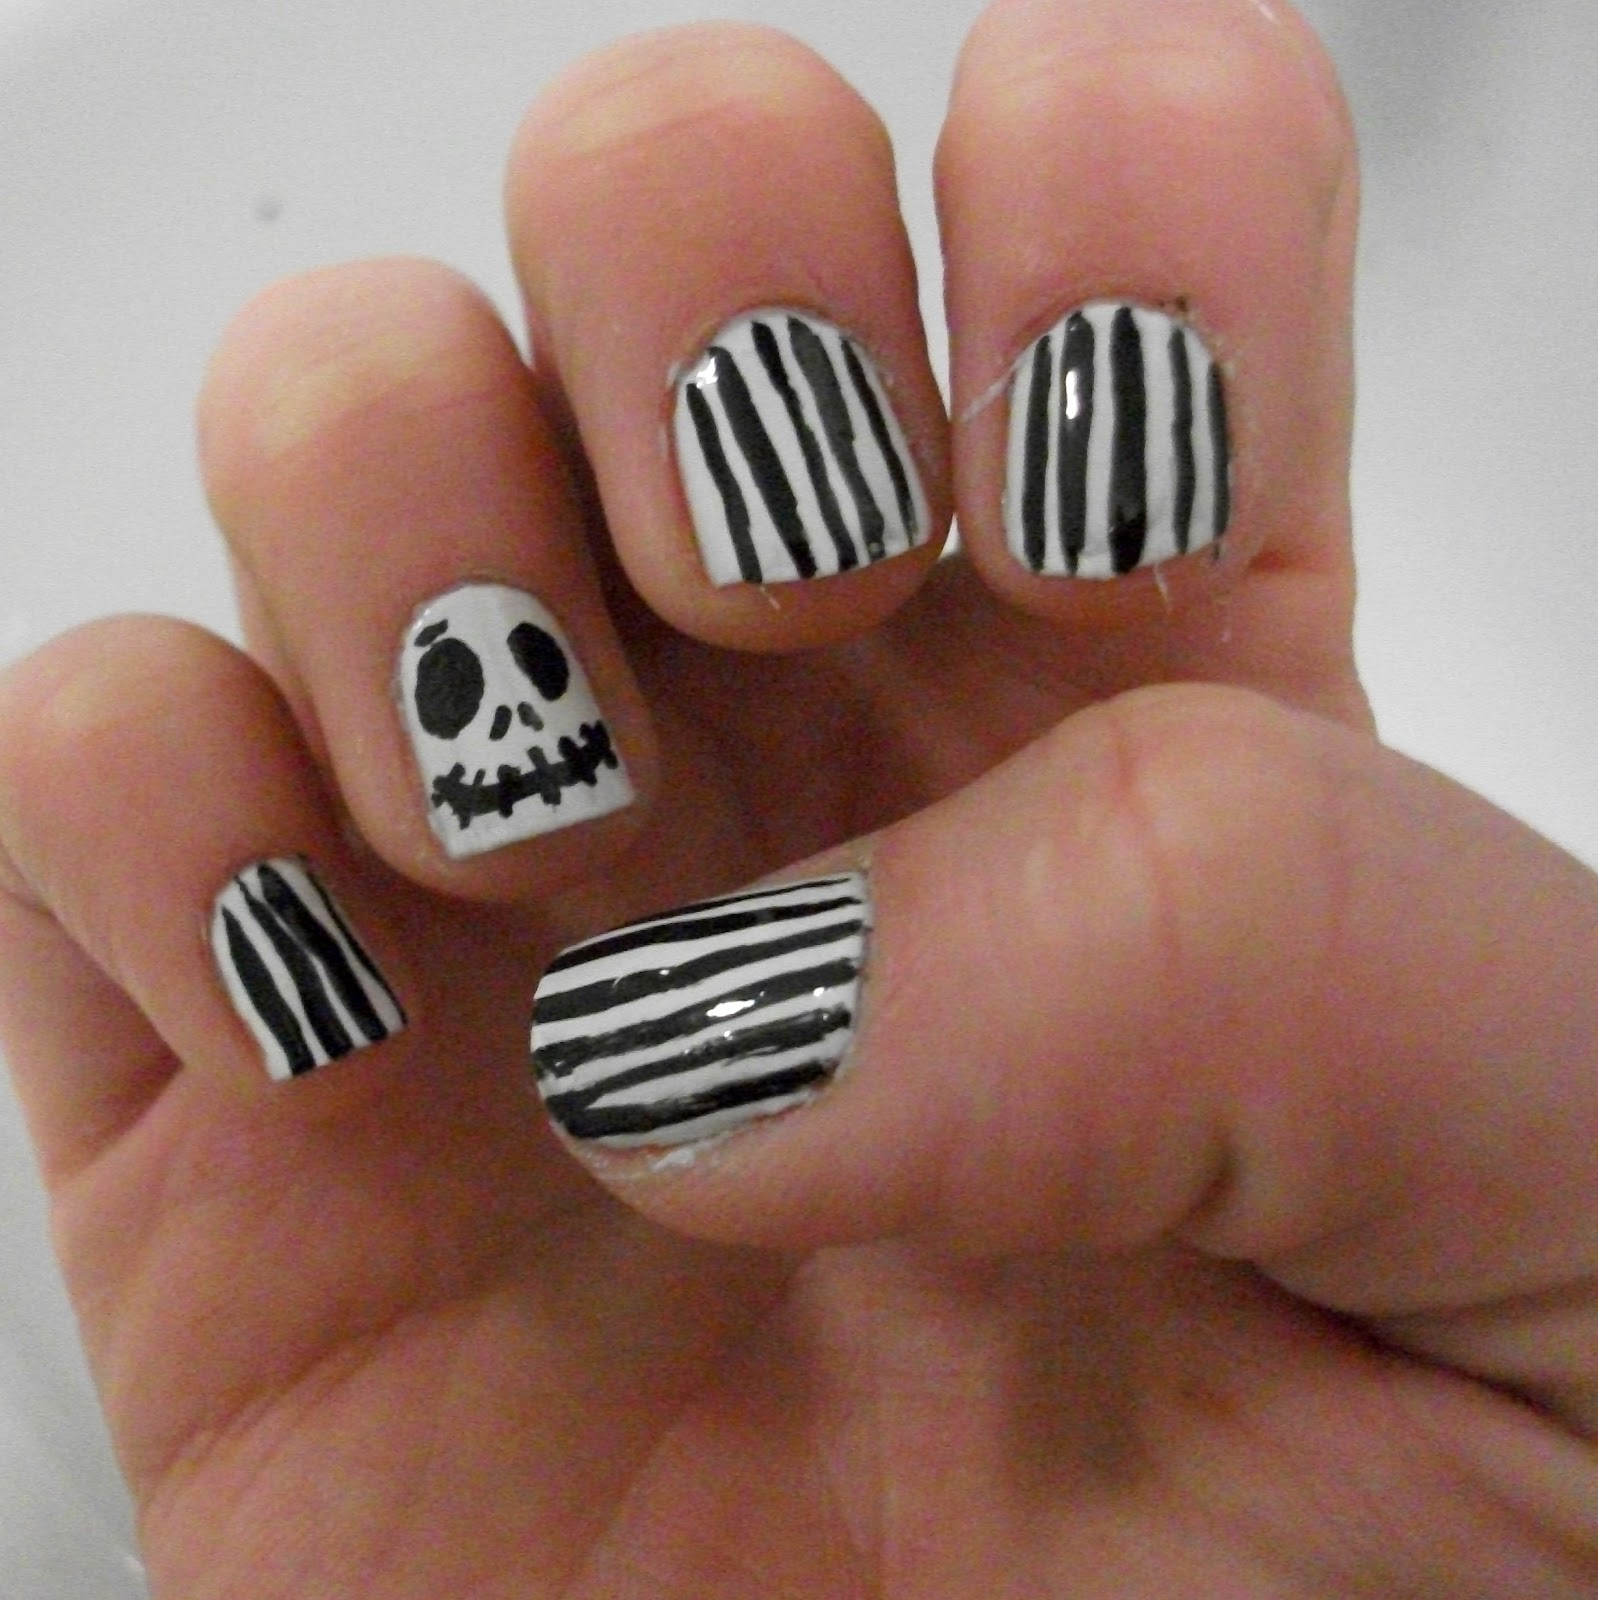 GemSeren UK Beauty Blog: Jack Skeleton Nightmare Before Christmas Nails